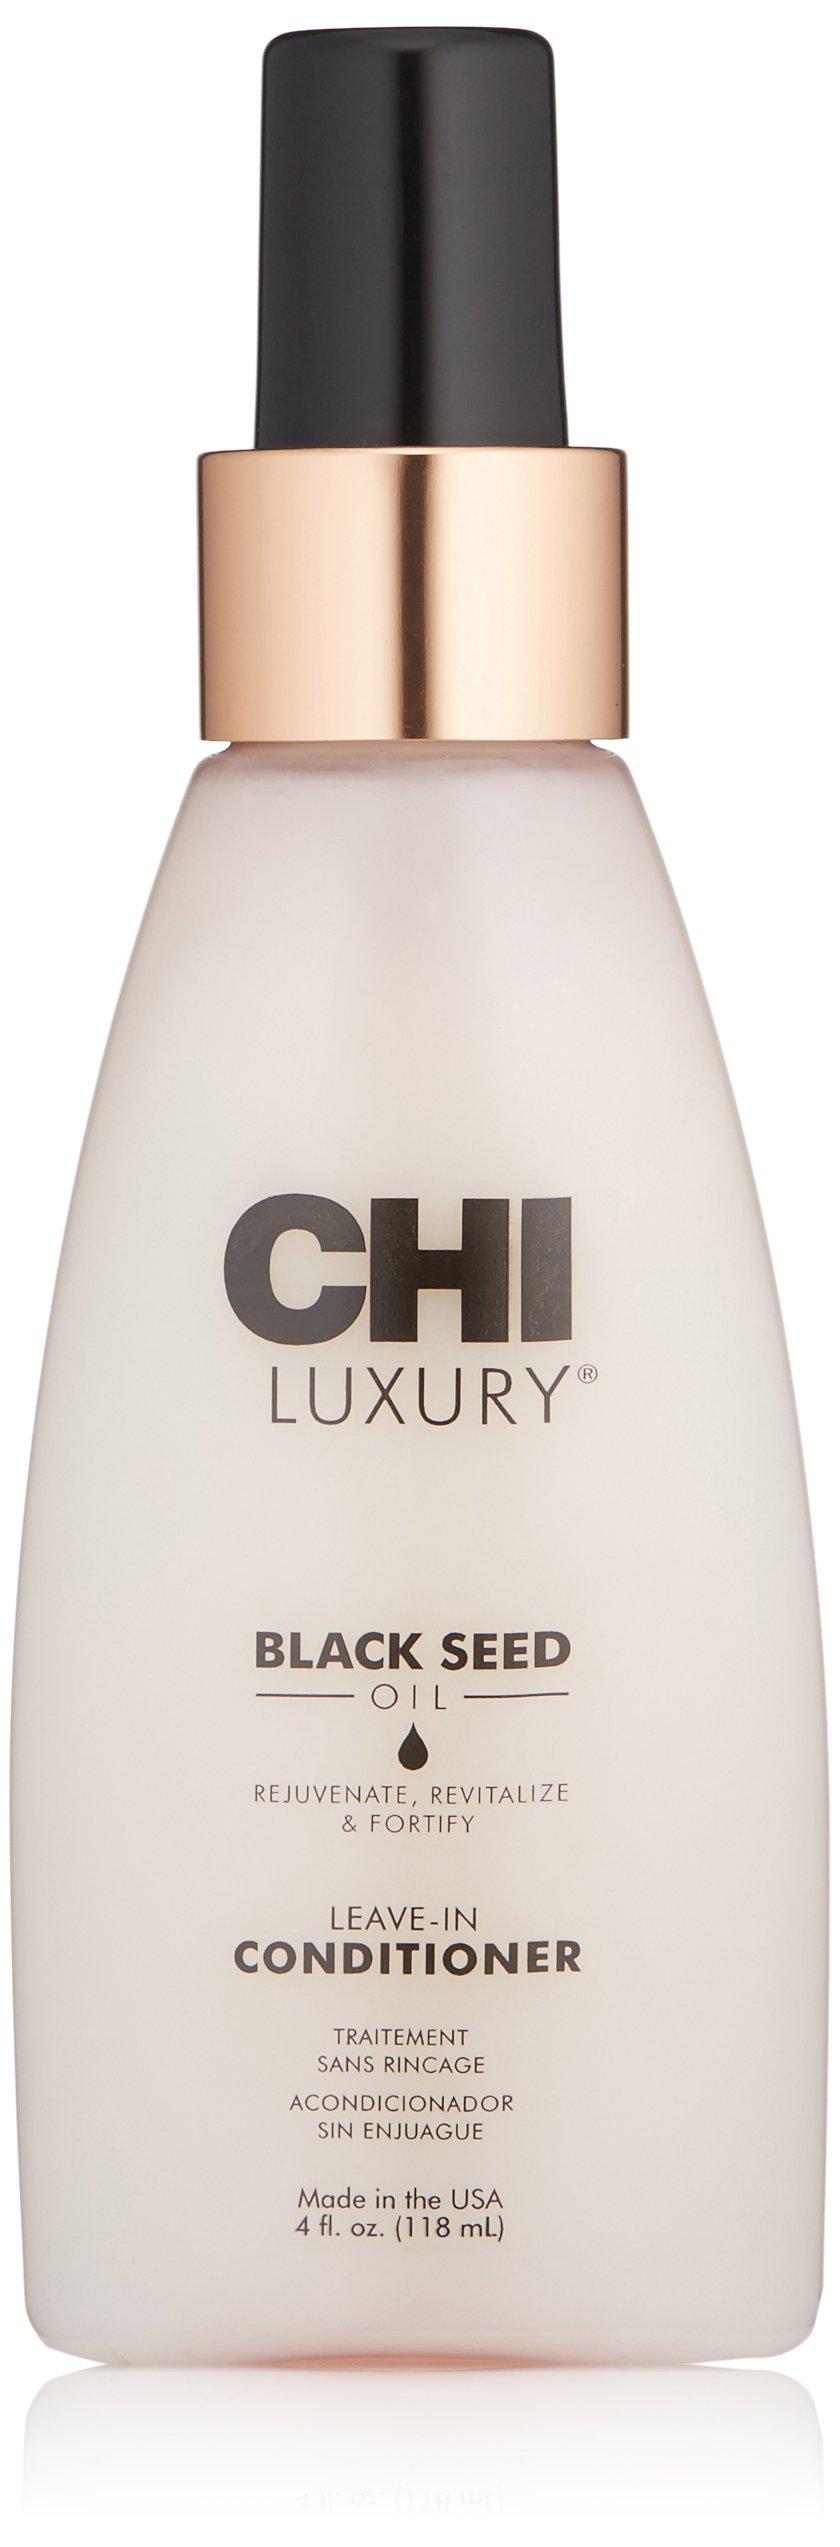 Amazon com: CHI Luxury Black Seed Oil Moisture Replenish